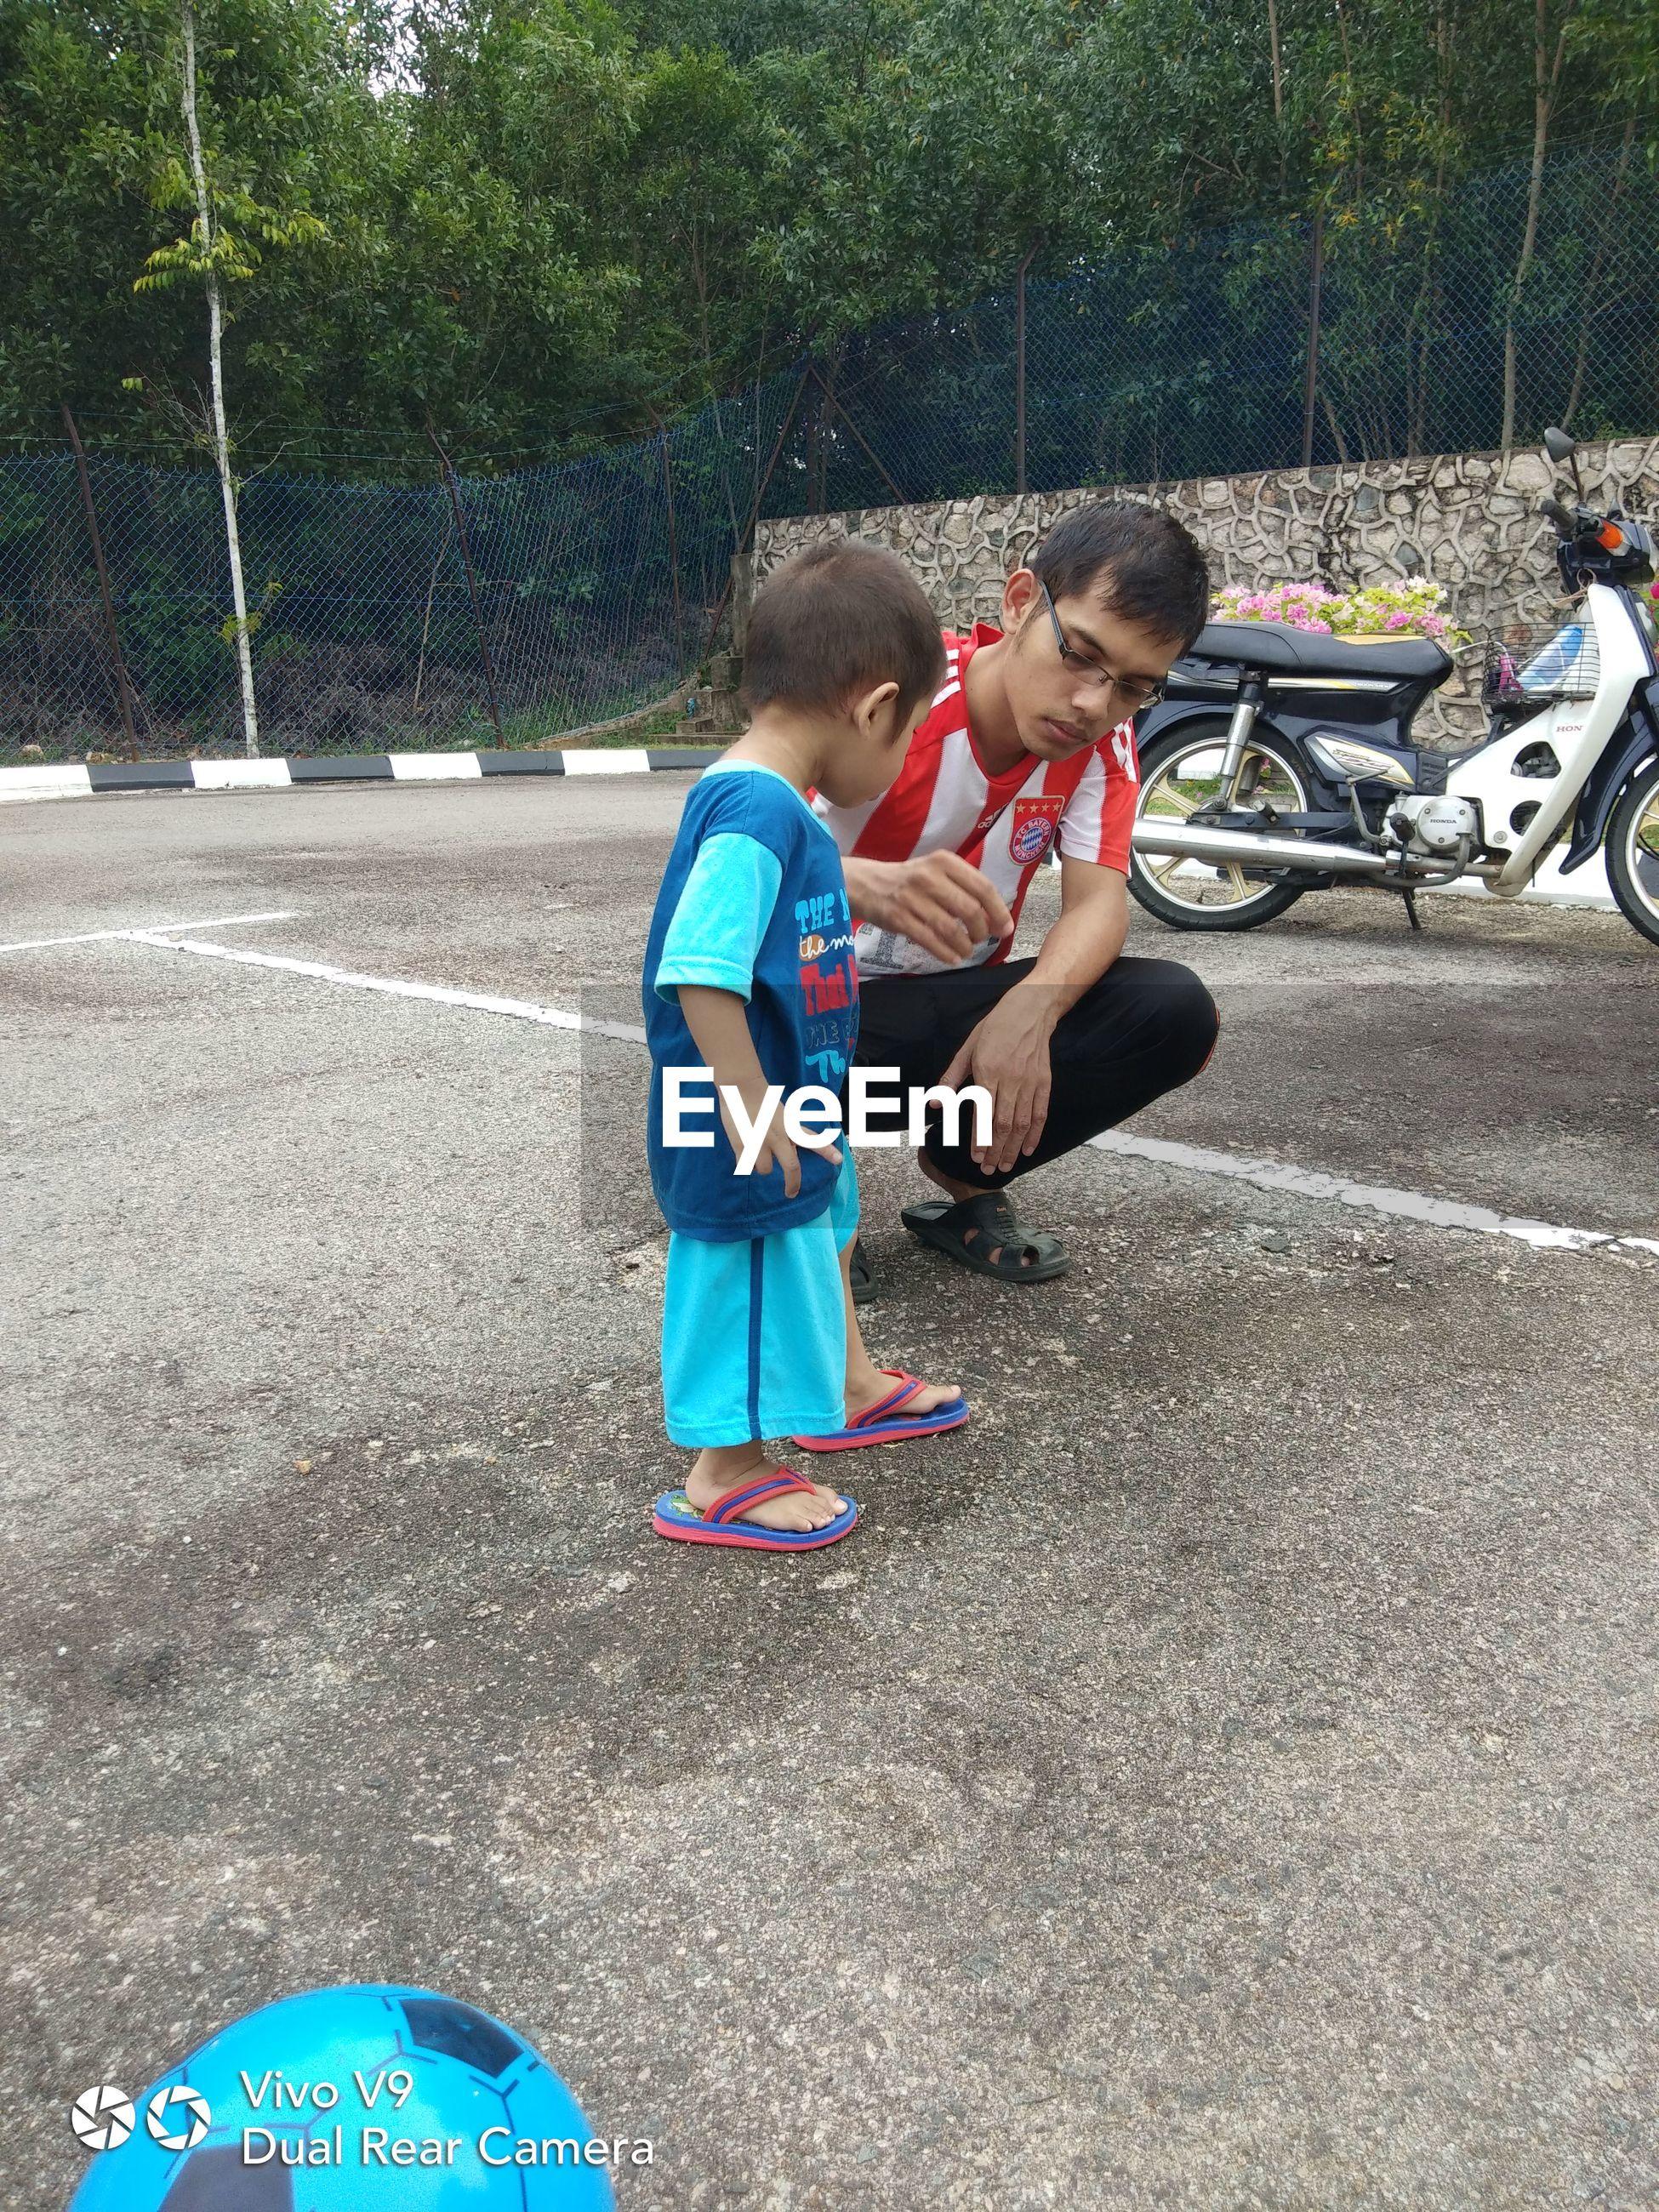 BOY AND GIRL WITH UMBRELLA